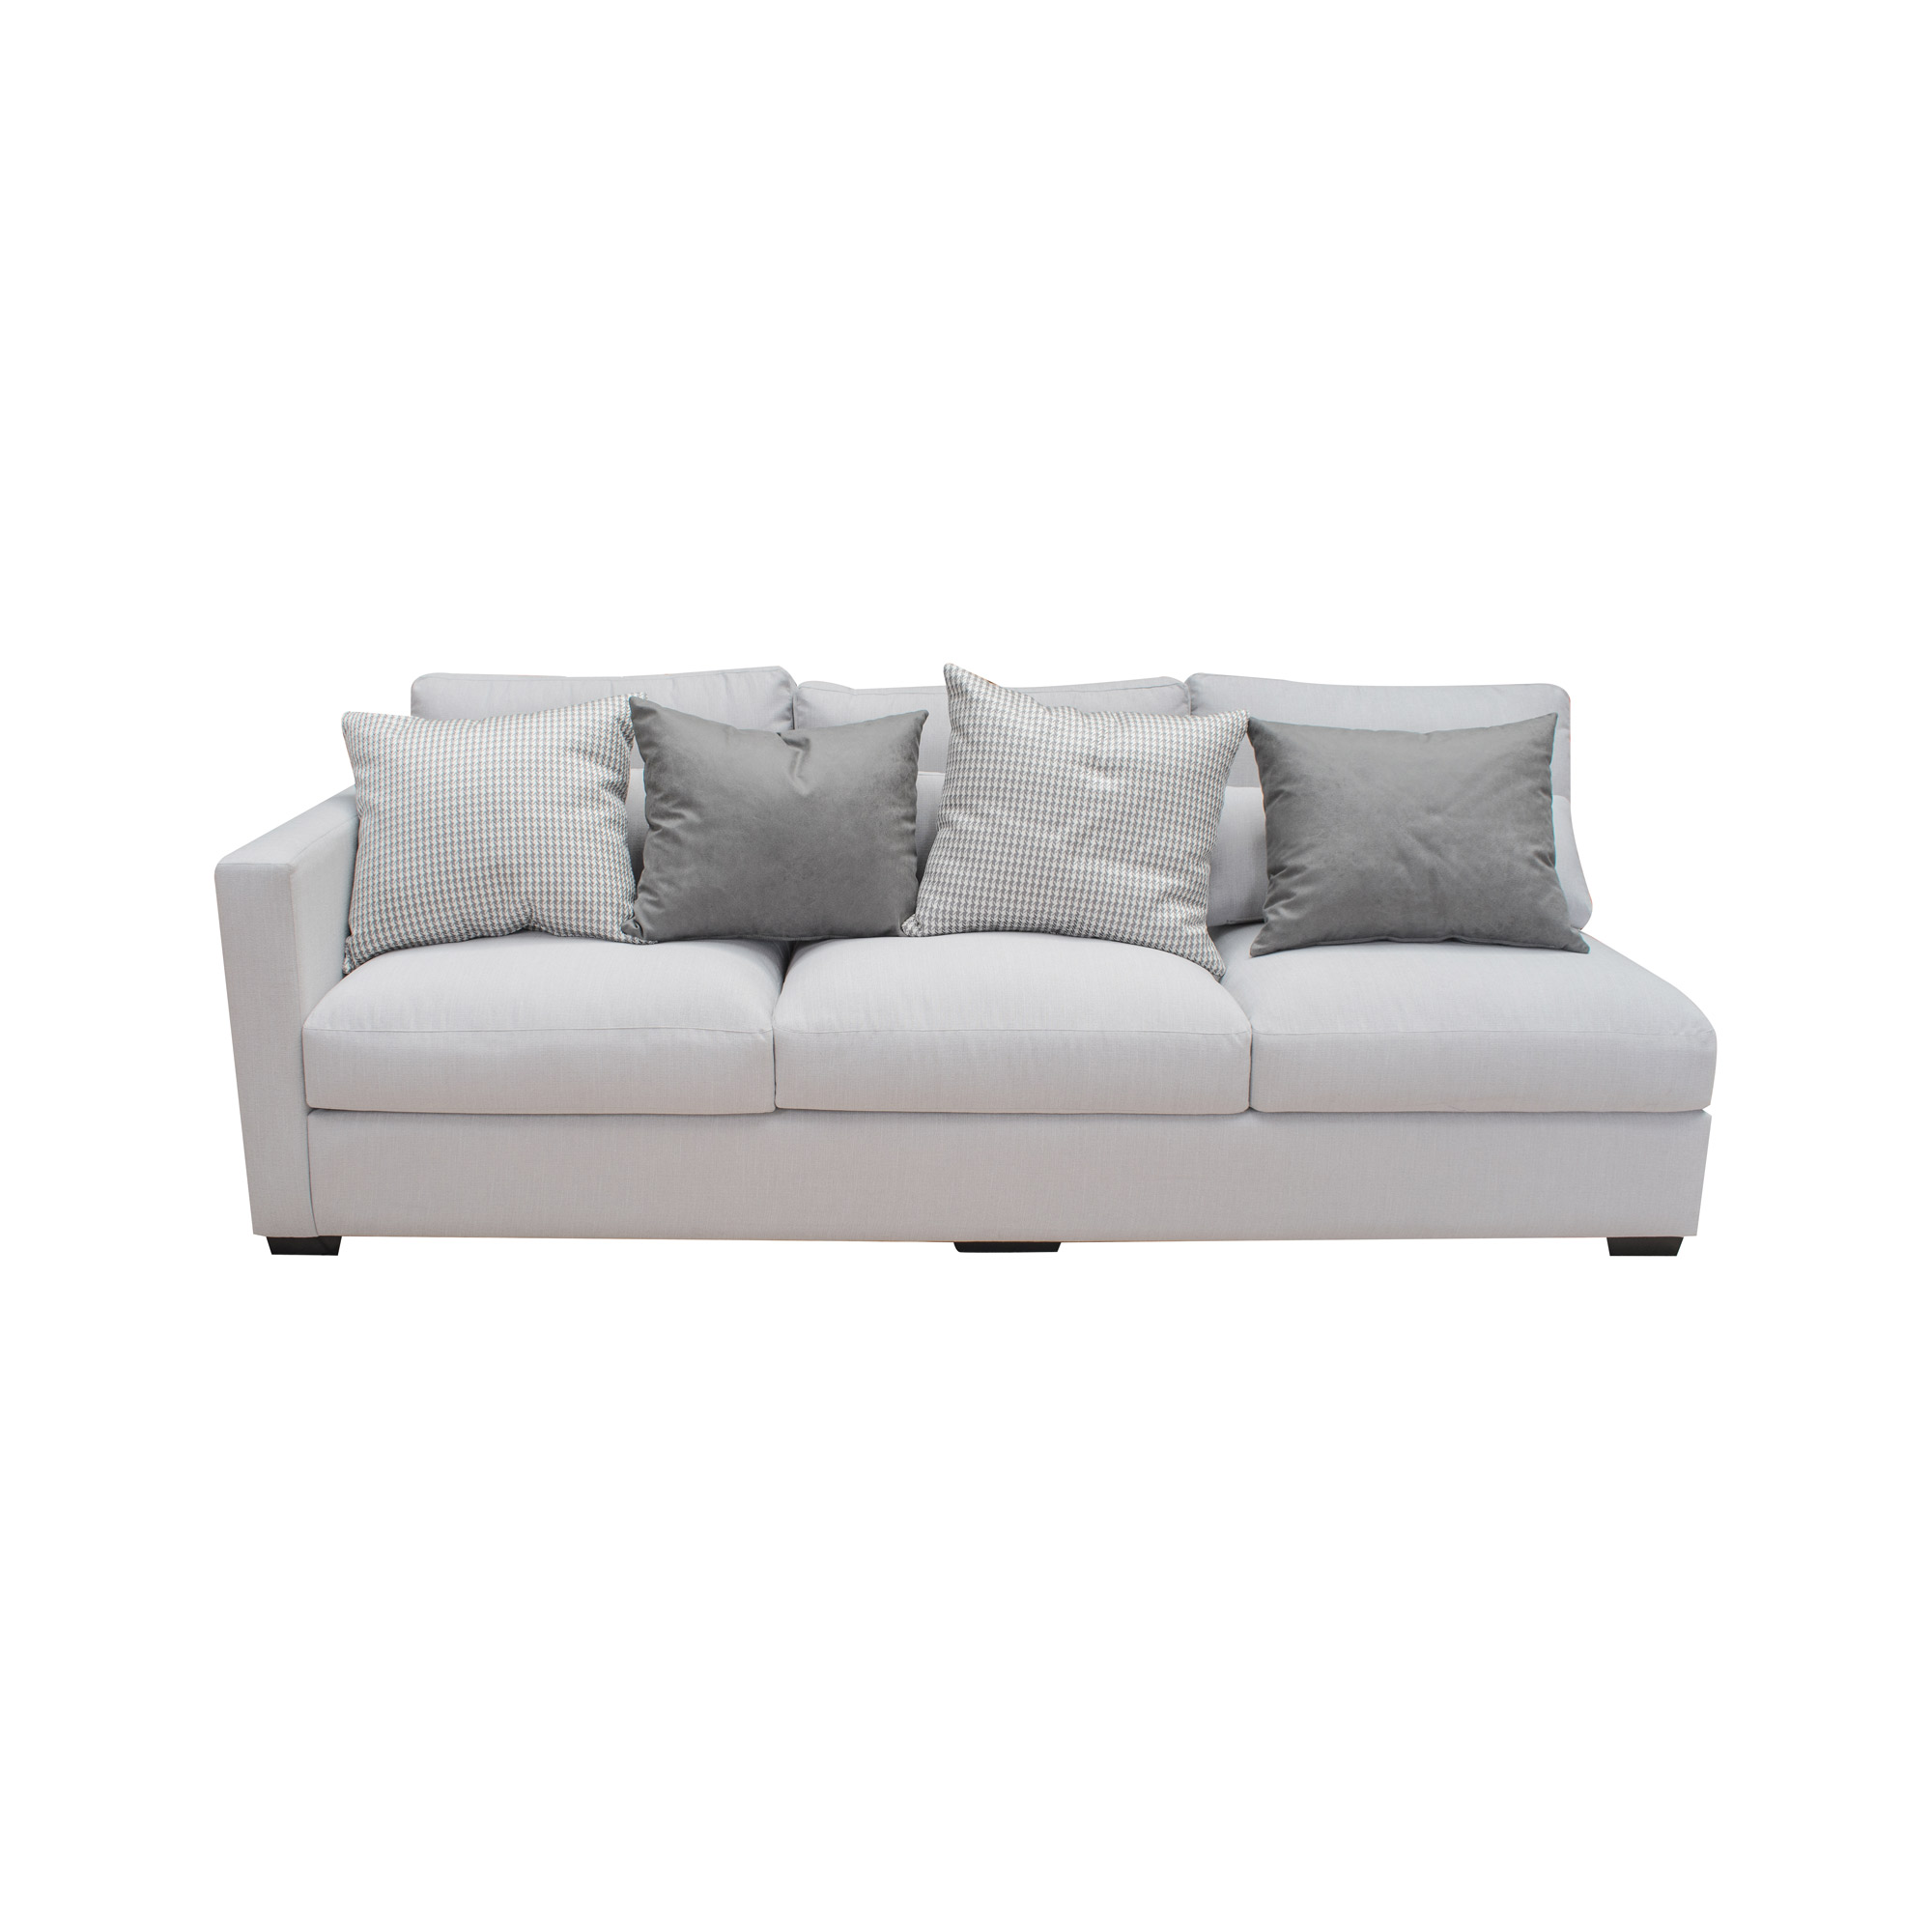 sofa-dante-izquierdo-1